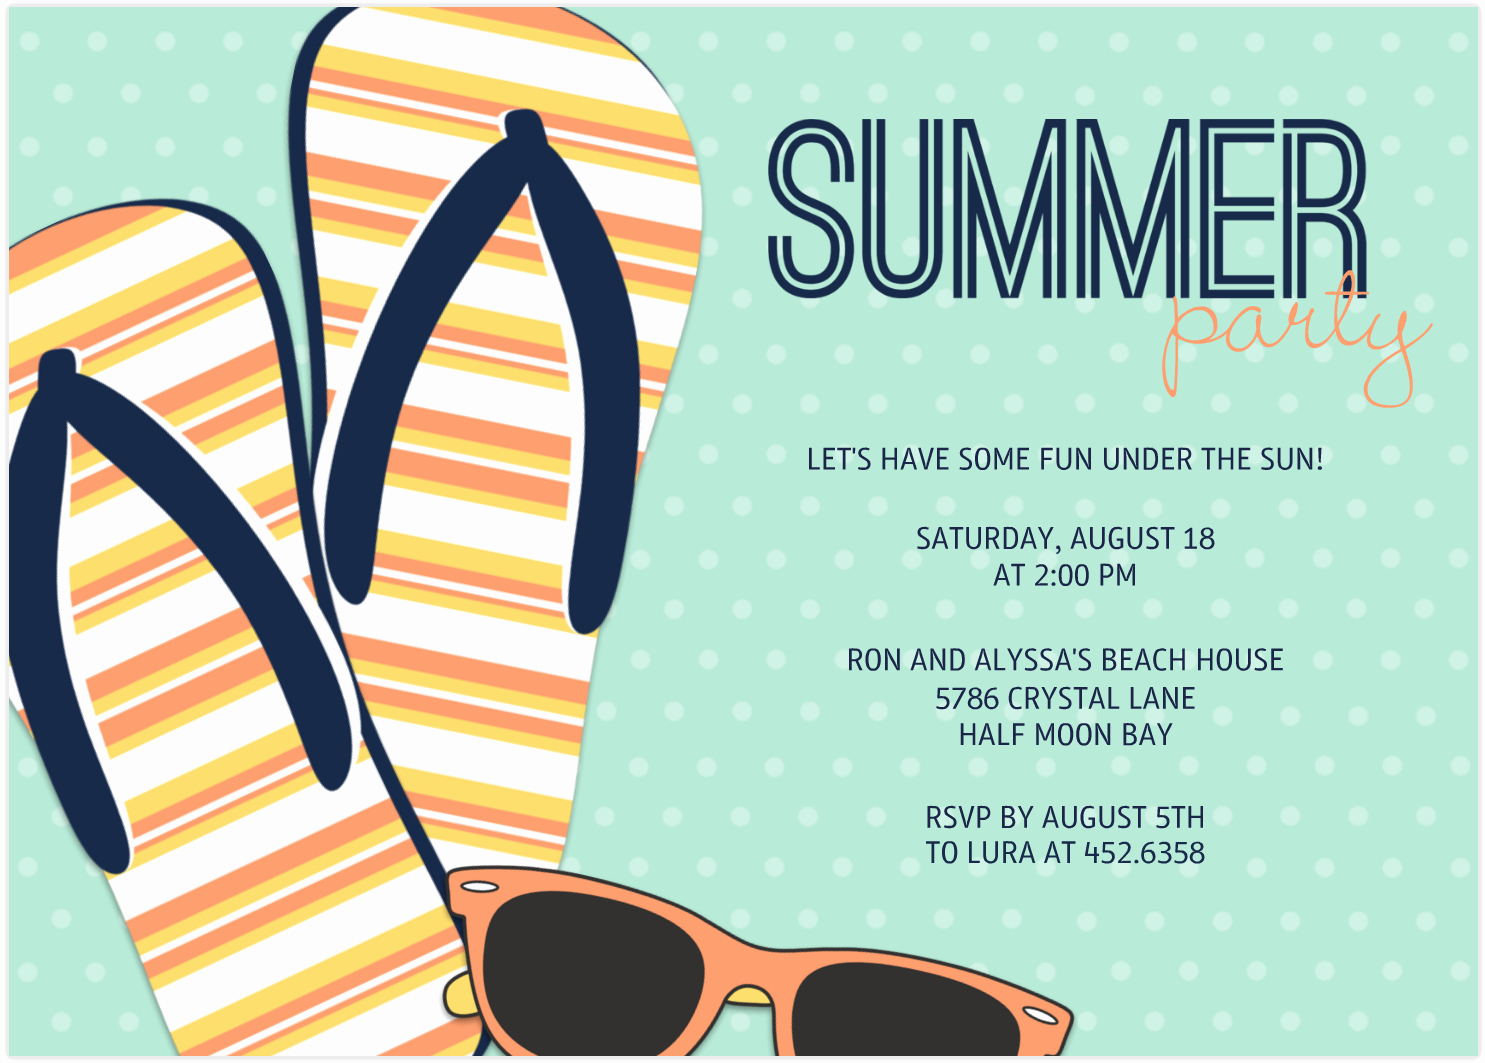 End Of Summer Party Invitation Elegant End Summer Party Invitations